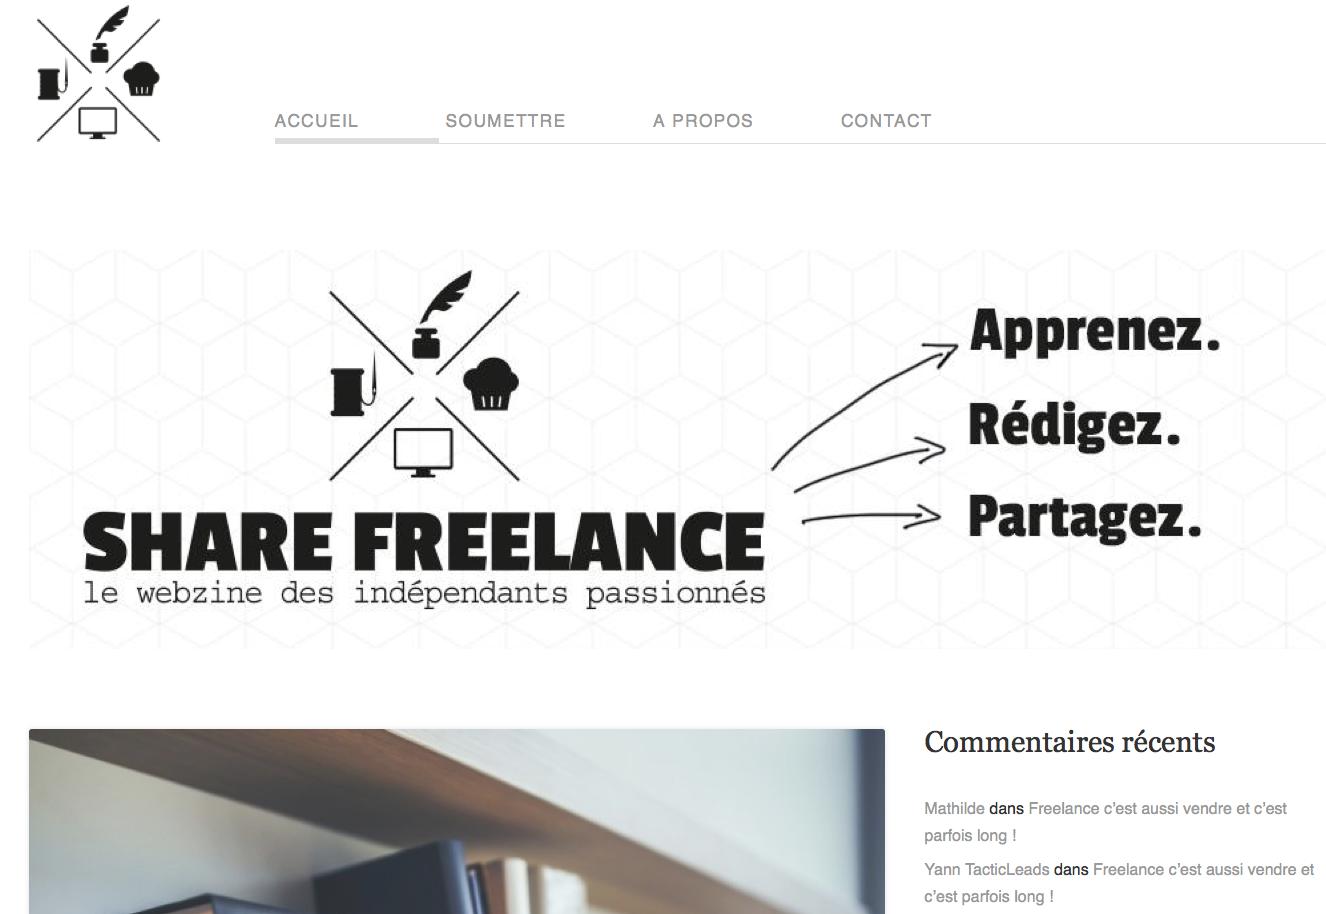 share freelance un blog communautaire qui encourage